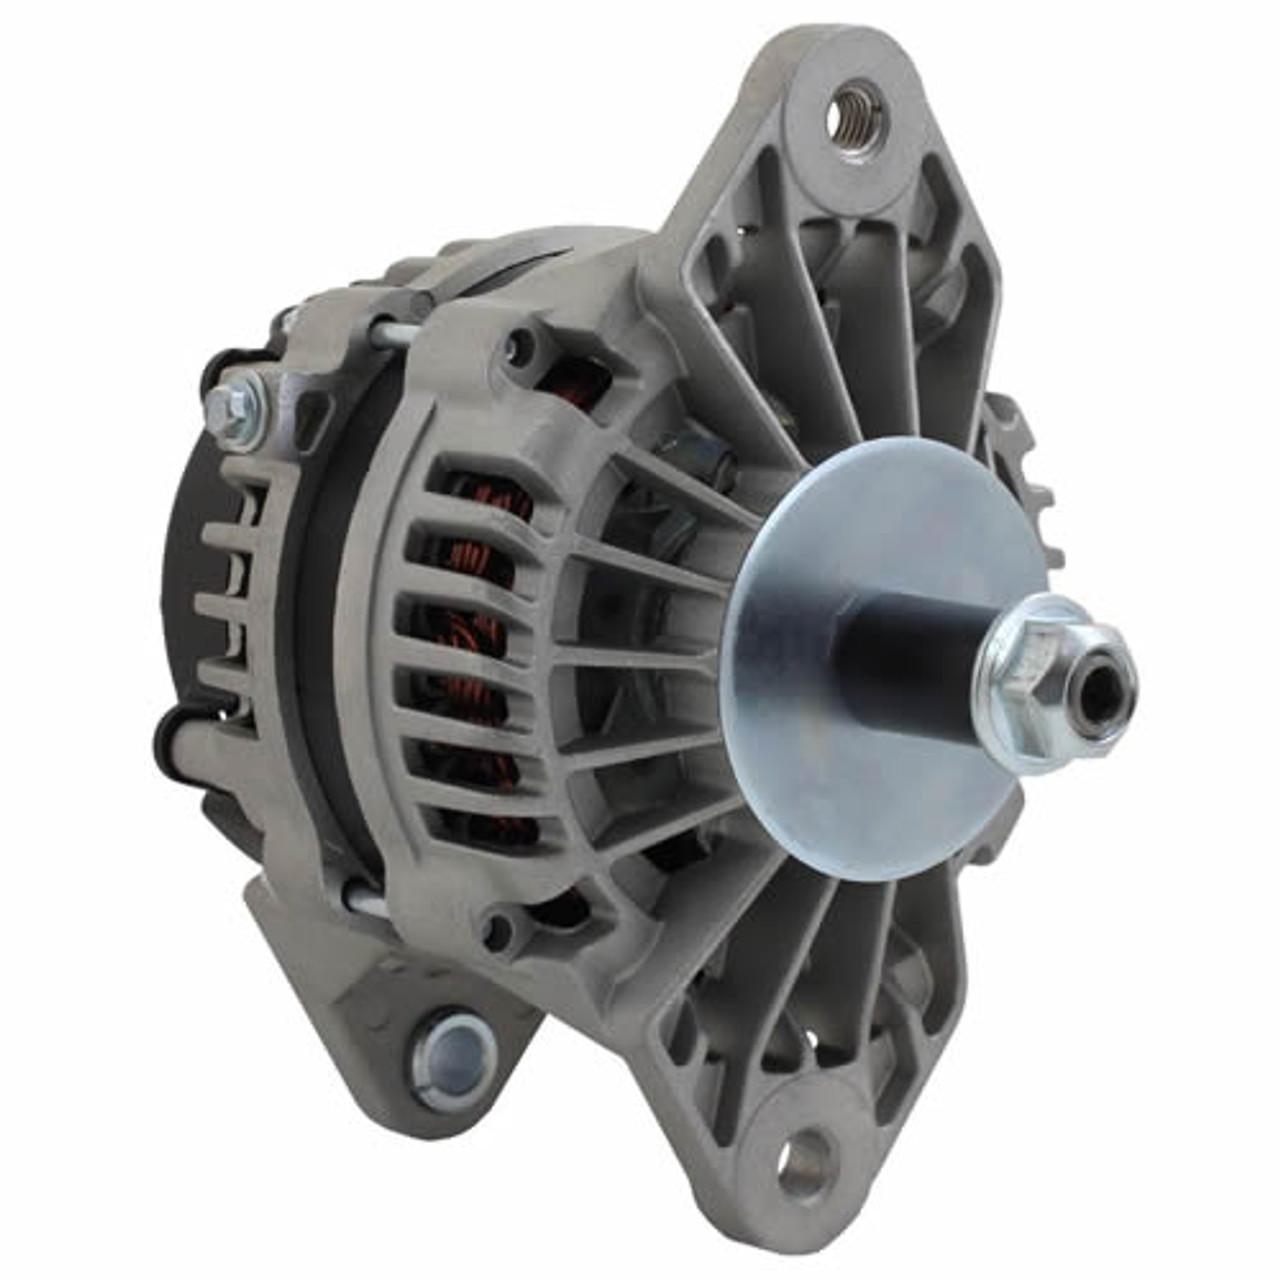 Alternator Fits Heavy-Duty Trucks 8600307 12 Volts 180 Amps Leece Neville Style